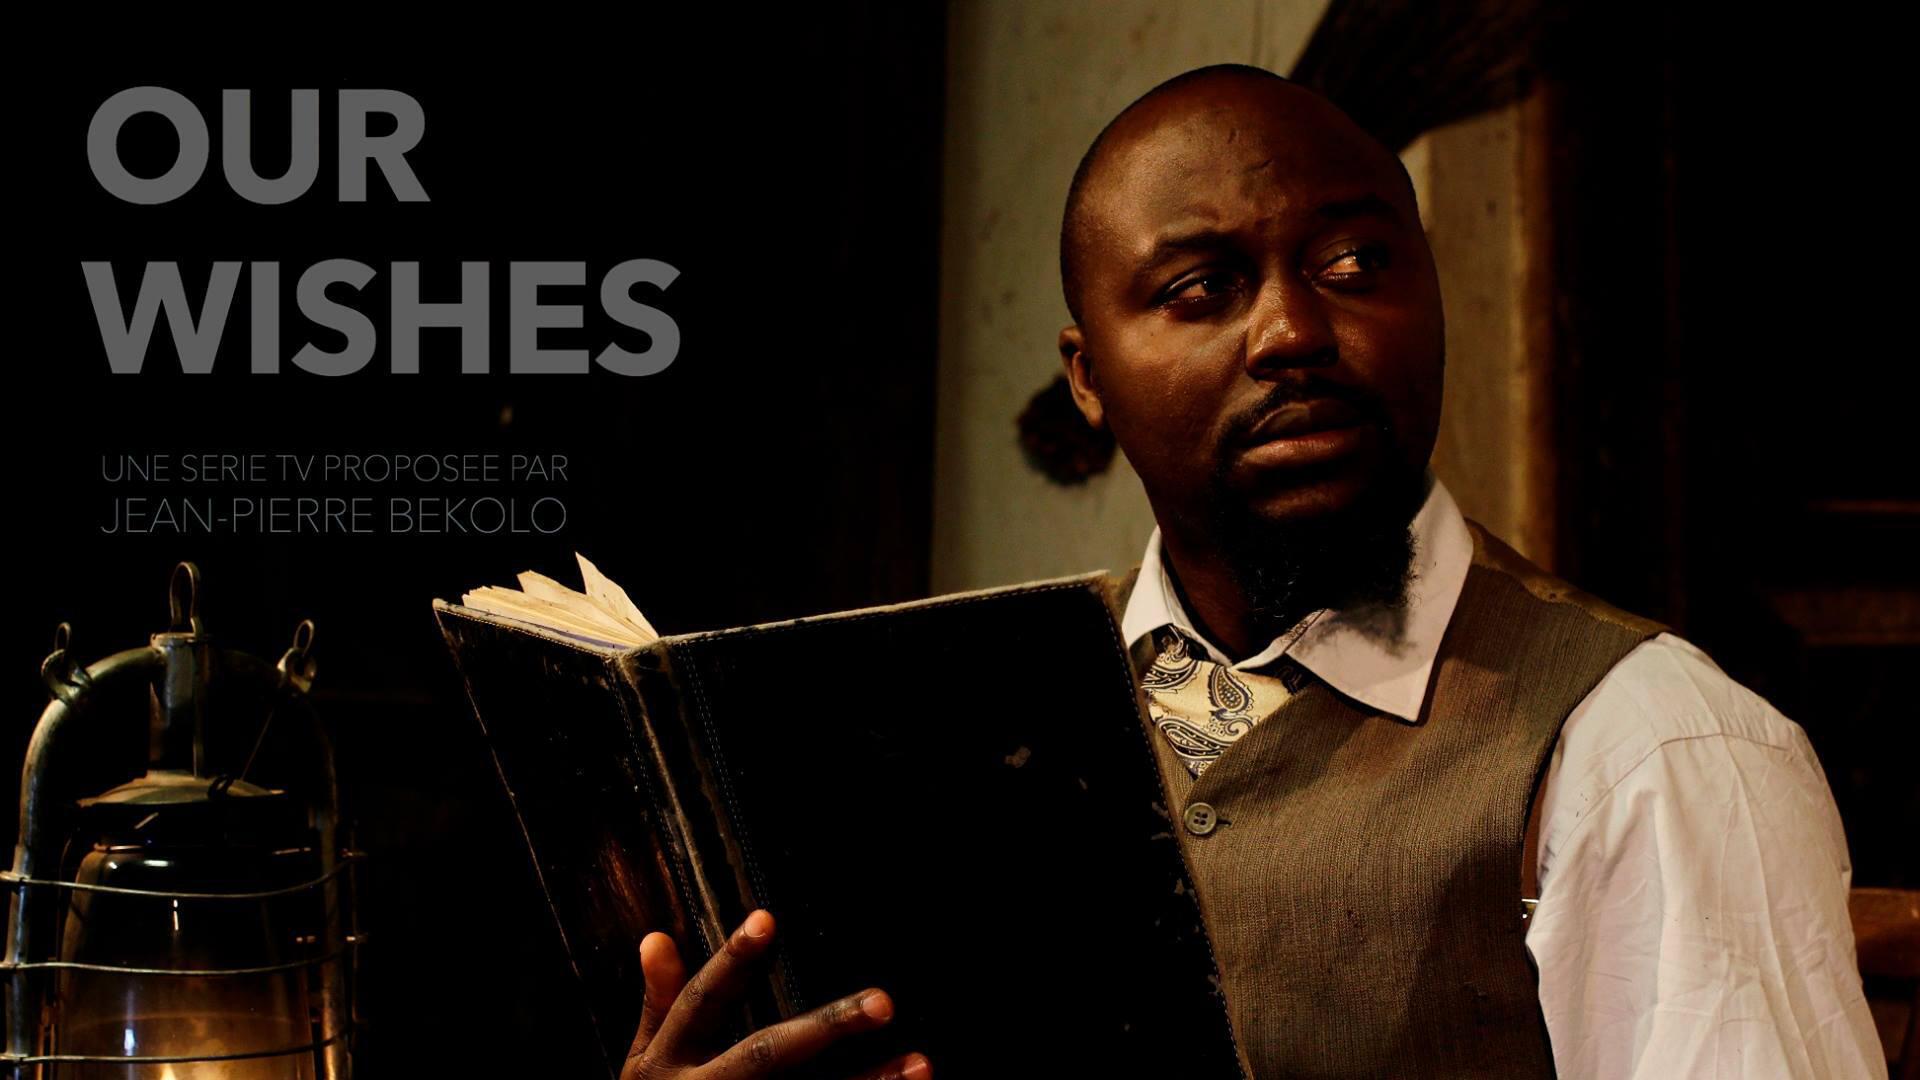 Our wishes - Jean-Pierre Bekolo - TV5 Monde